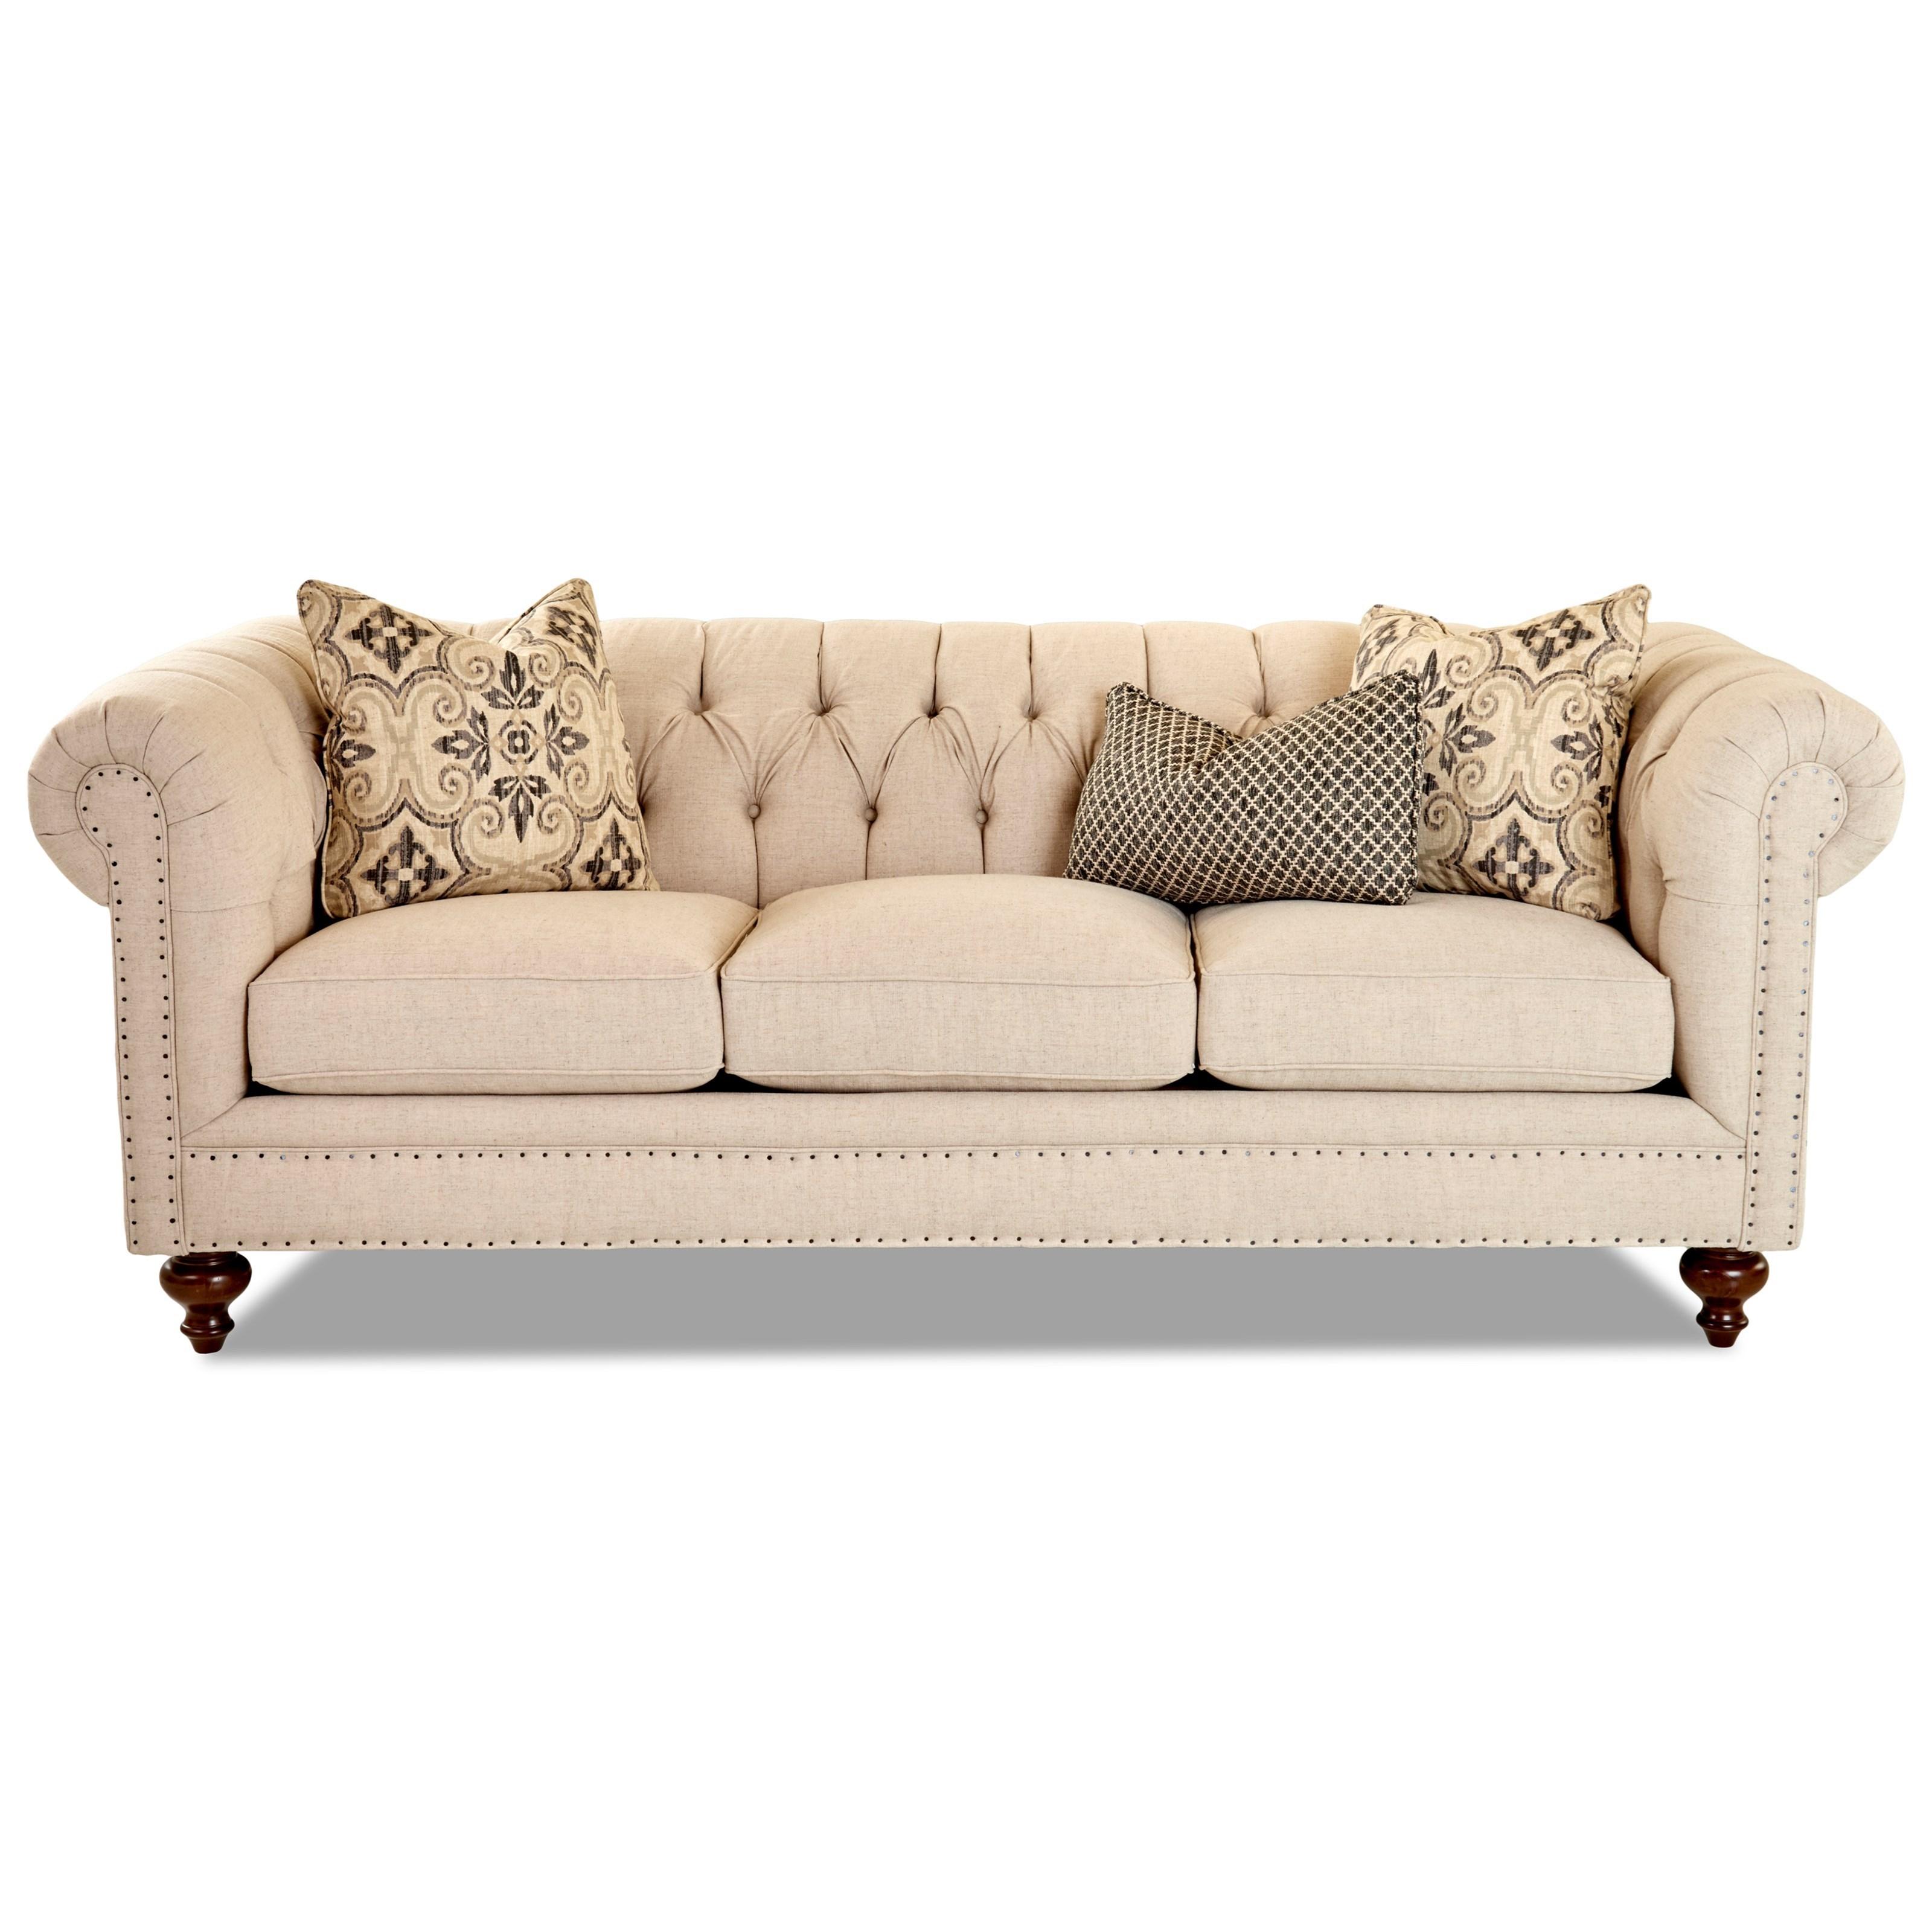 Klausner sofa klaussner charlotte distinctions by for Klaussner sofa